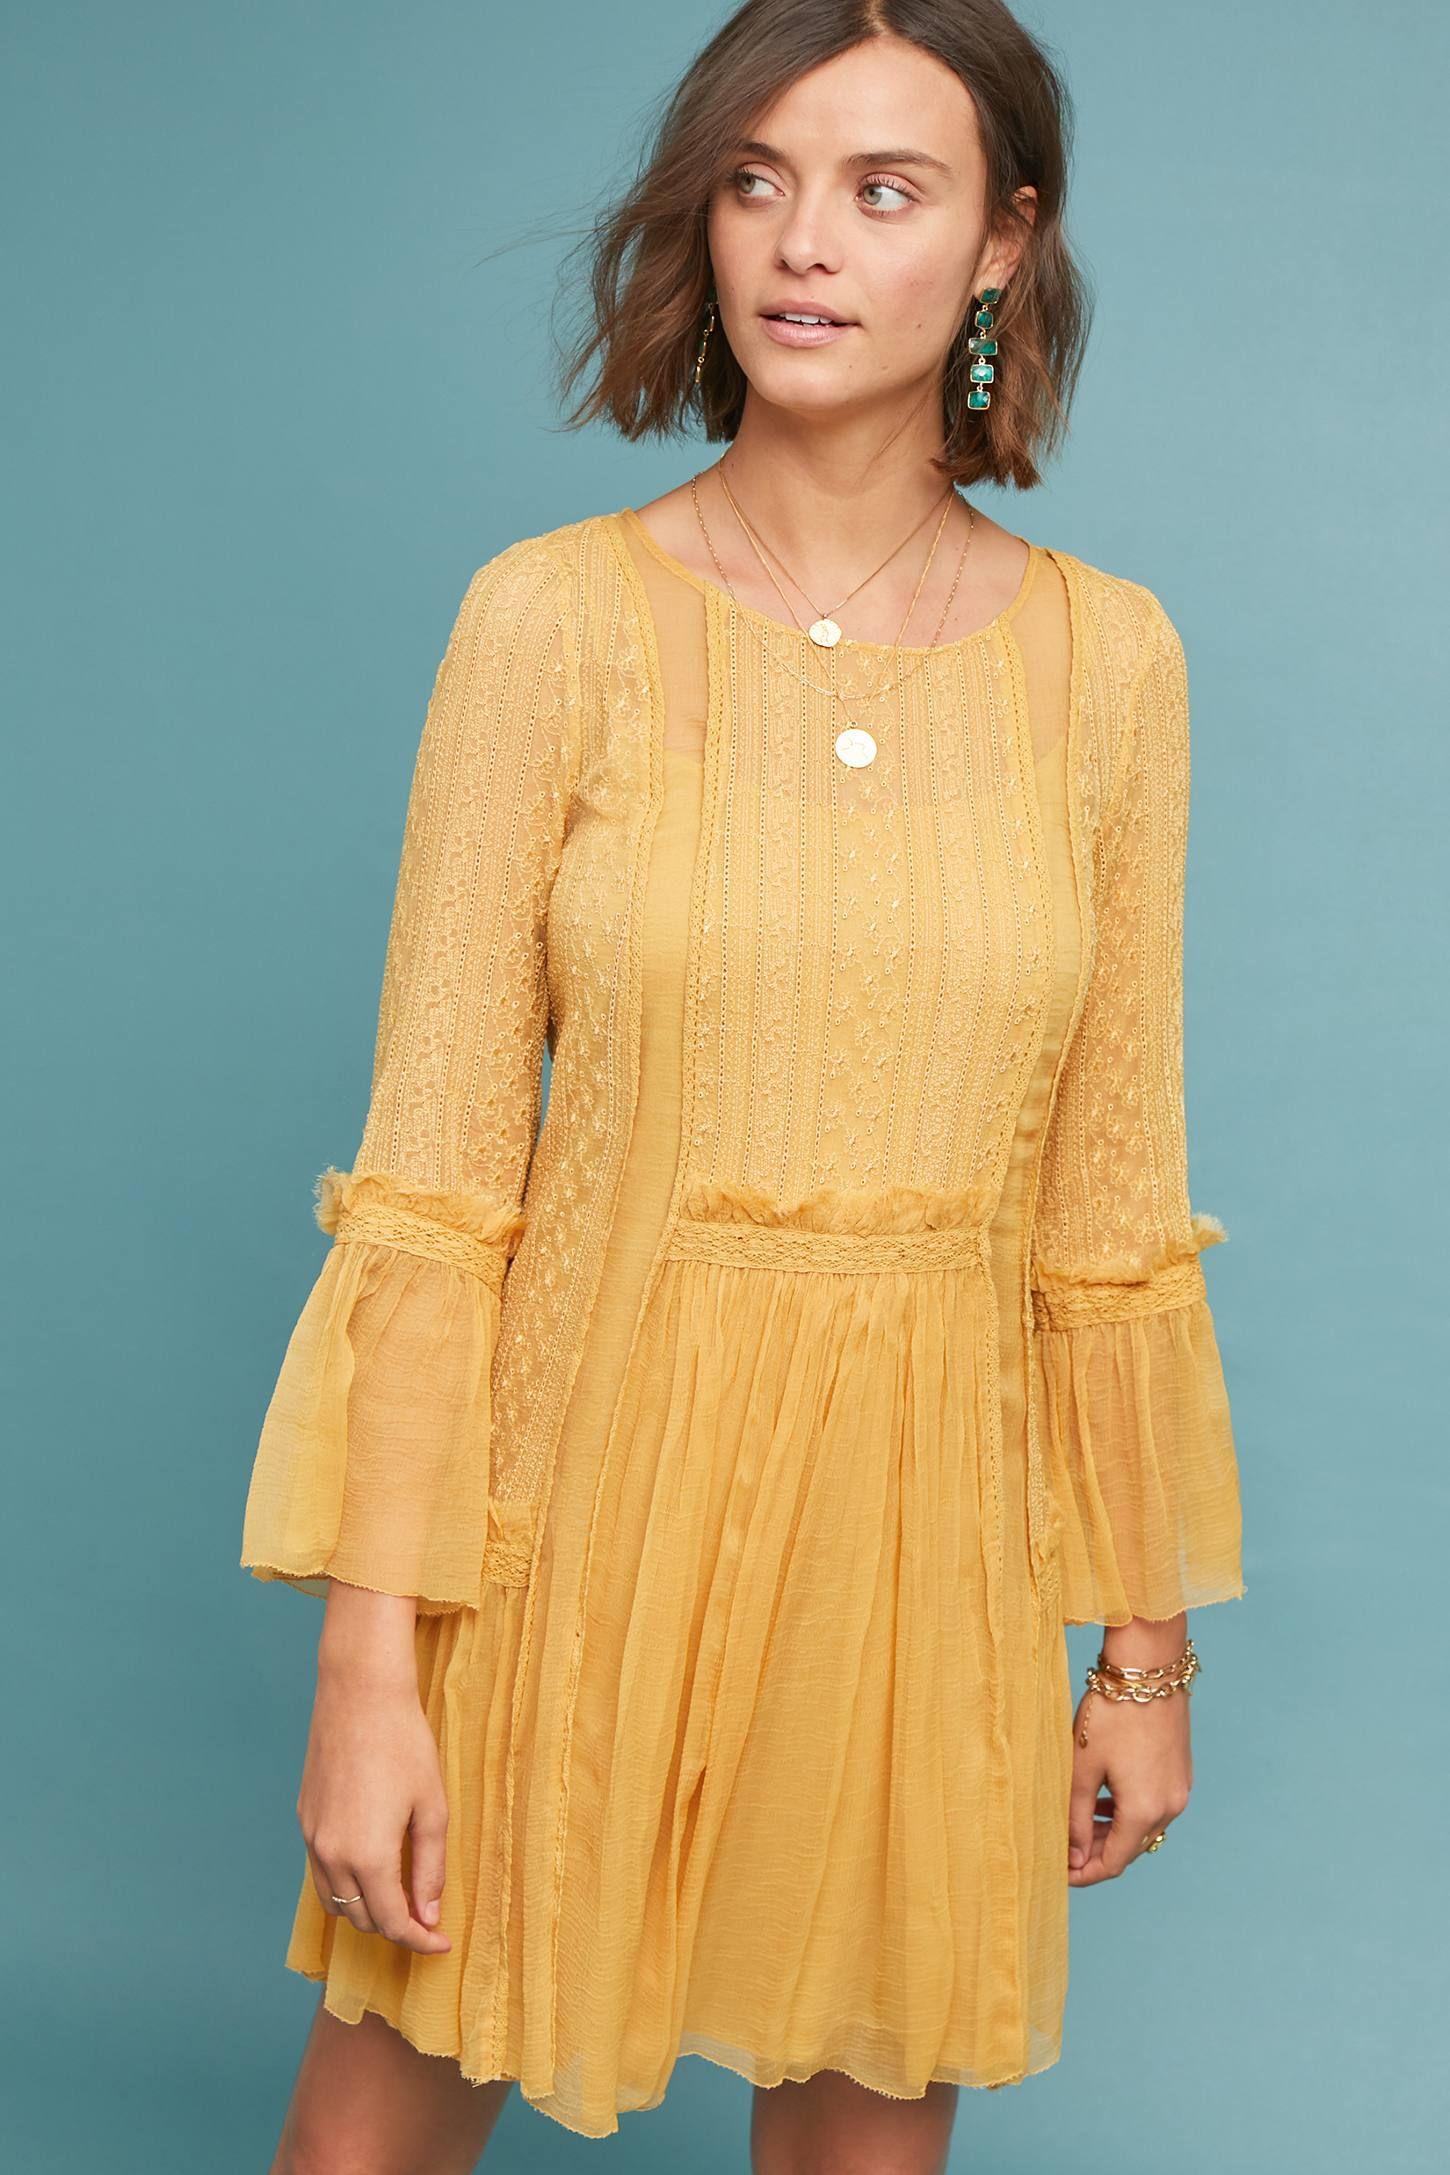 6b13b14f9a6 Senji Tunic Dress in 2019 | My Style | Dresses, Yellow dress summer ...